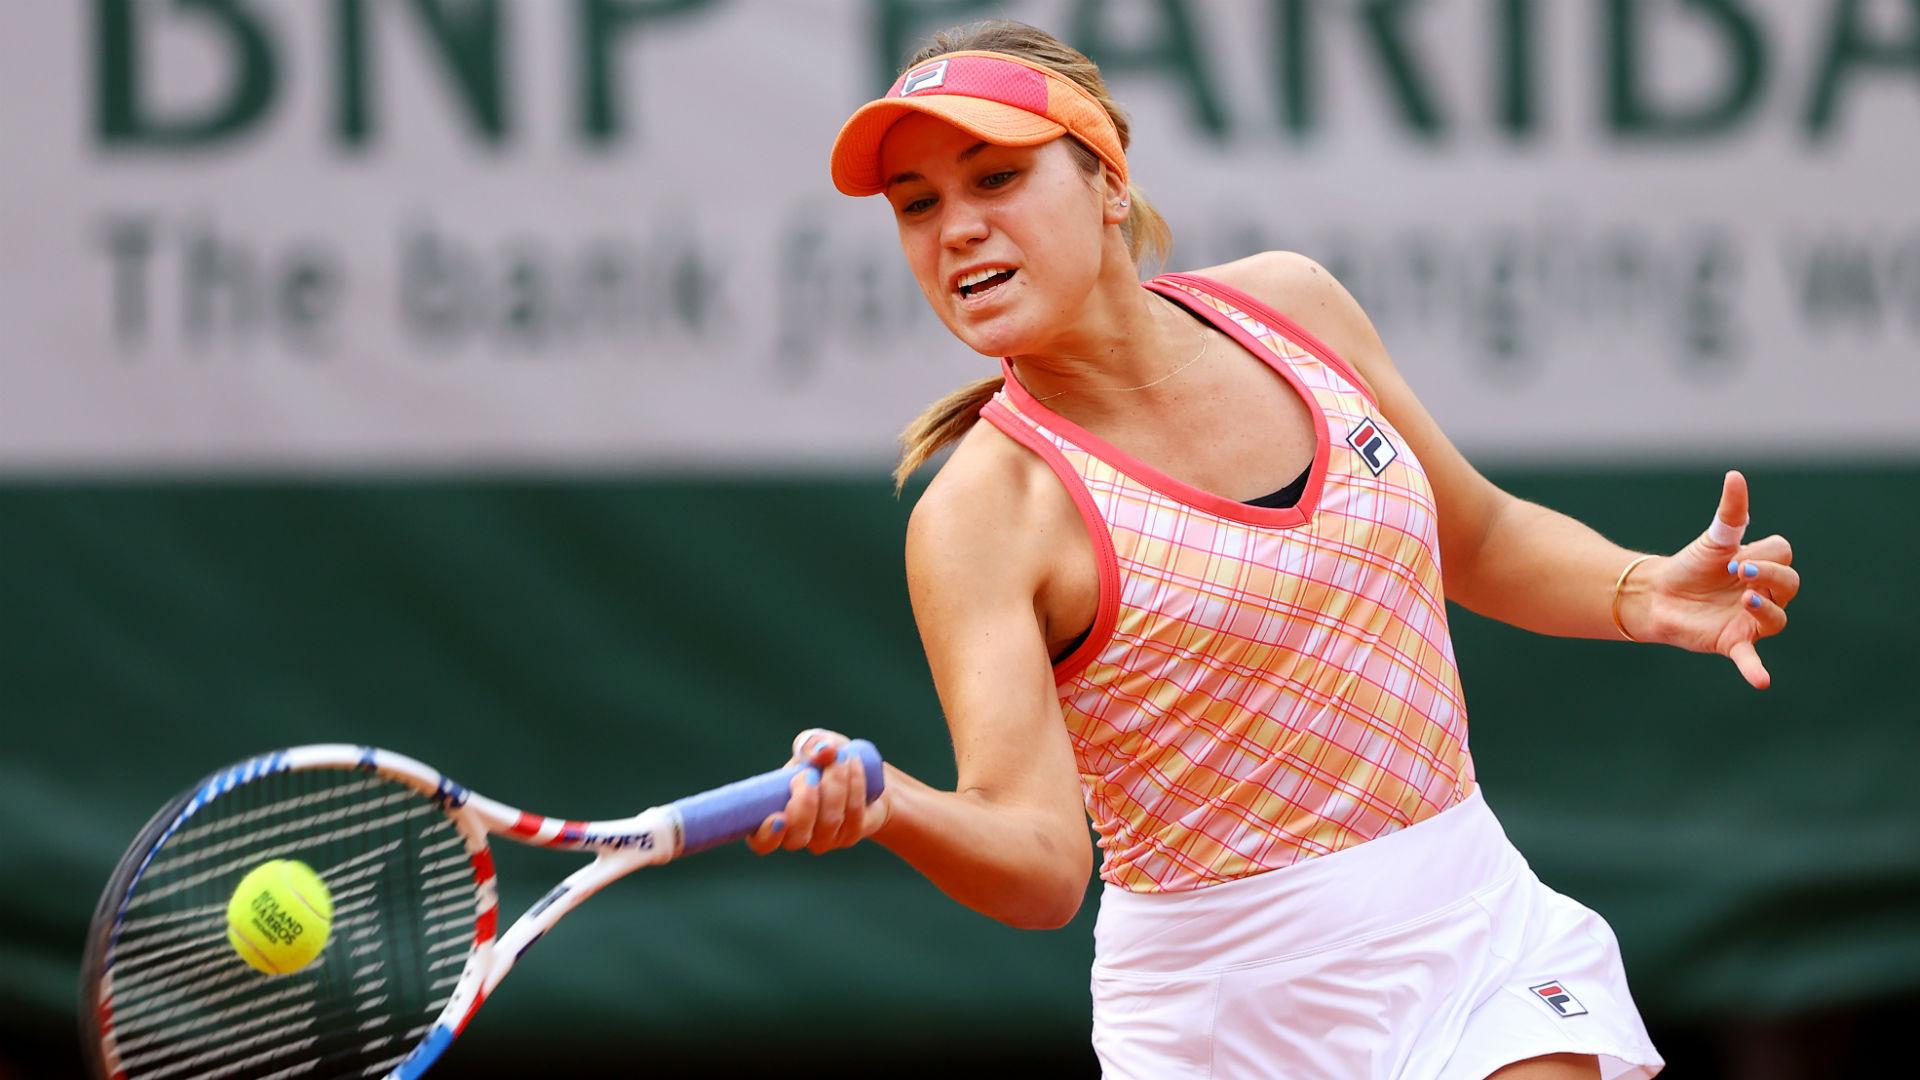 French Open 2020: Sofia Kenin wins all-American battle with Danielle  Collins   Sporting News Australia